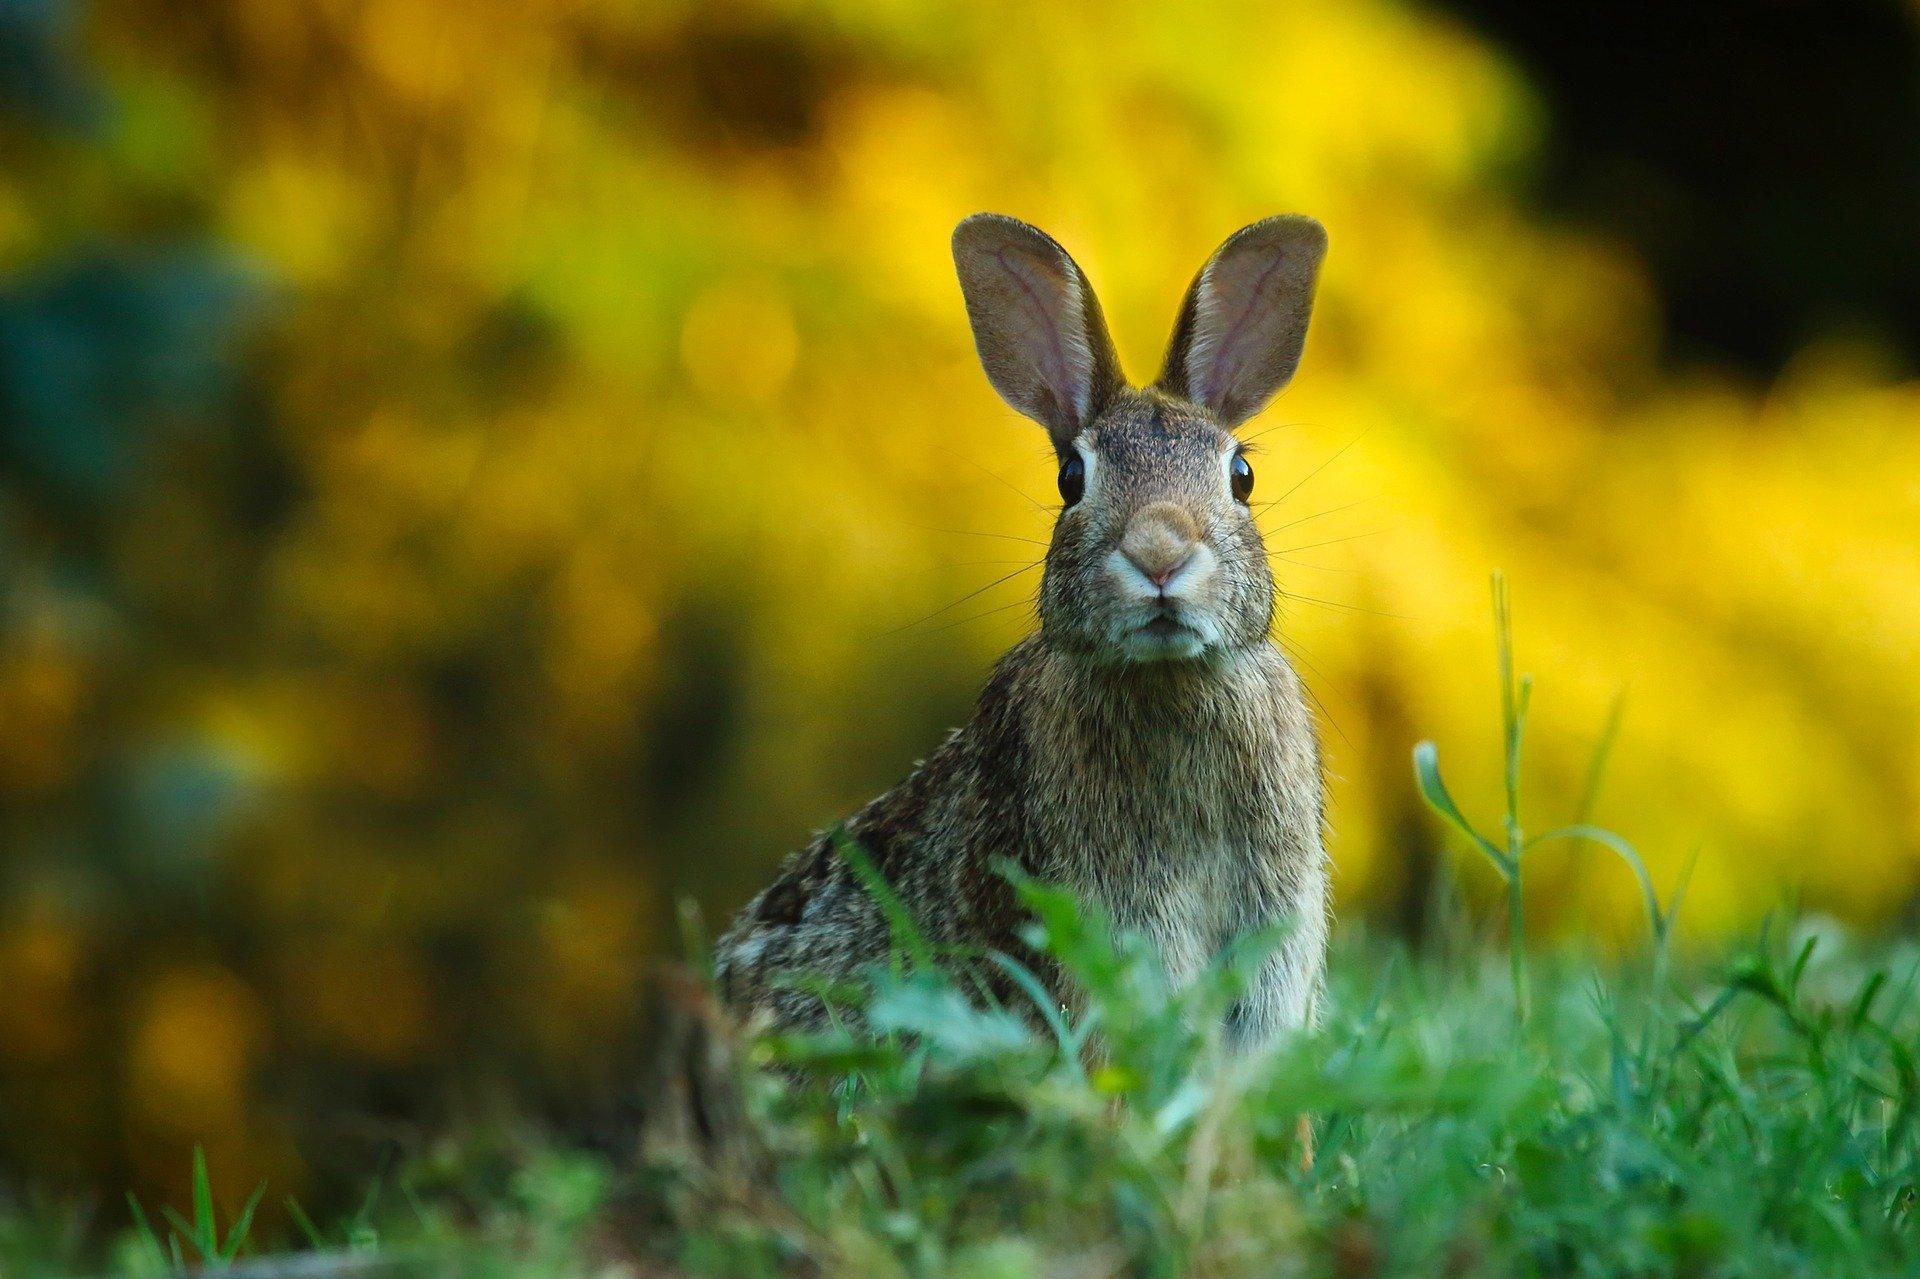 Kaninchen - rabbit